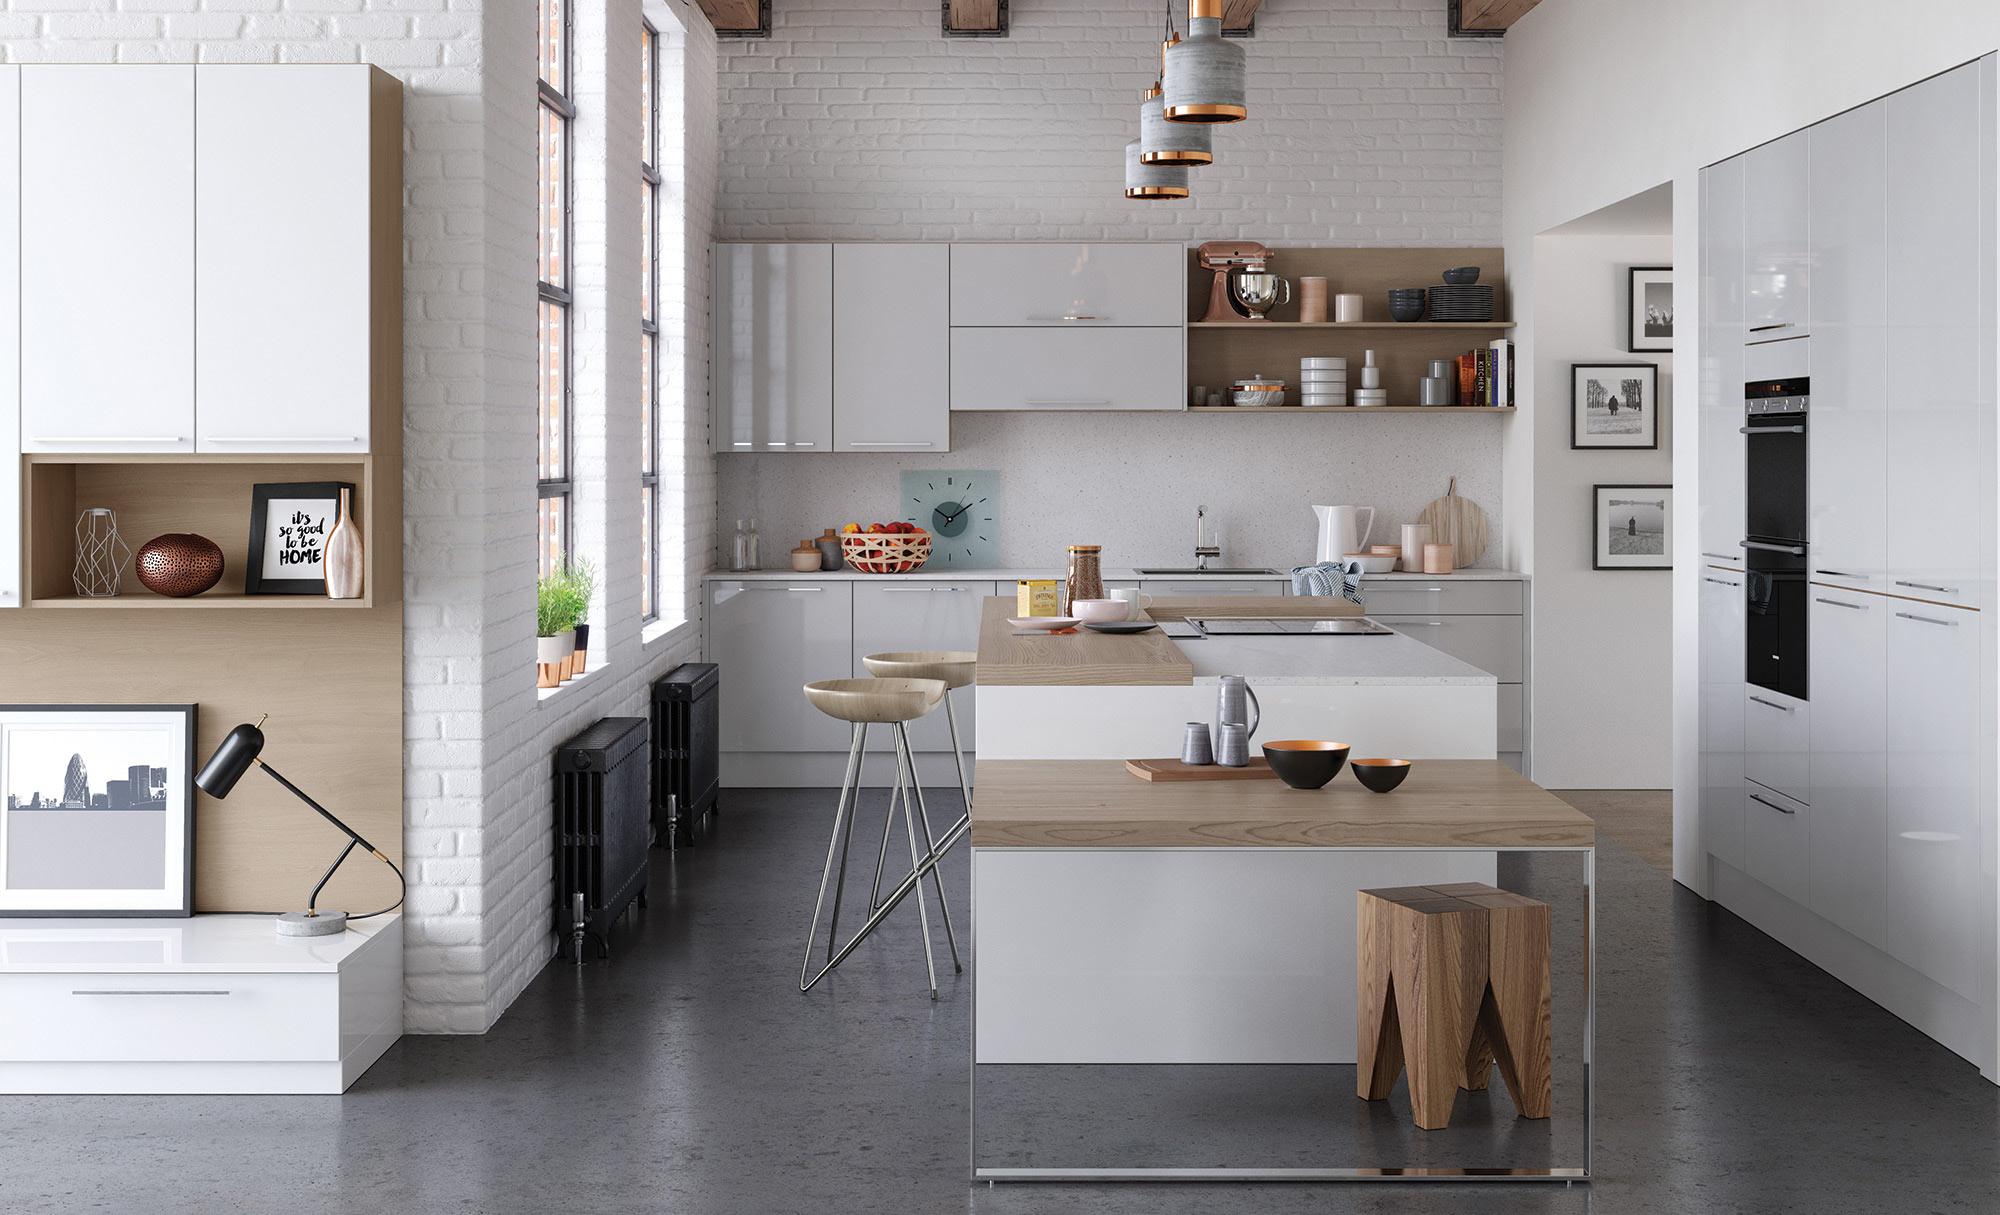 Uform Zola Gloss White & Light Grey Kitchen